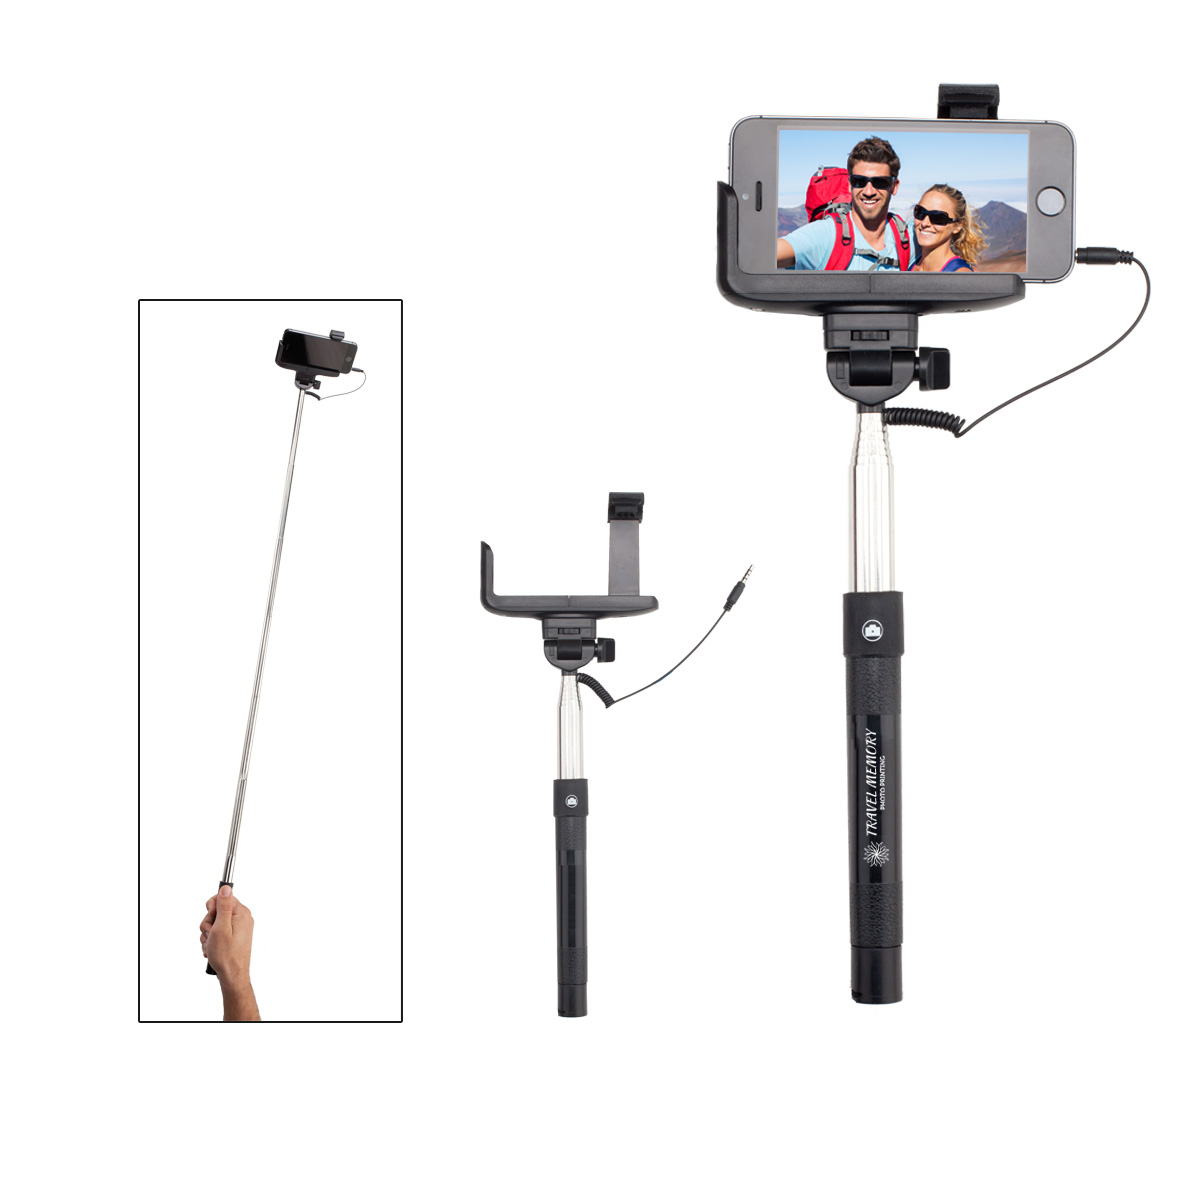 Selfie Sticks / Remote Shutters